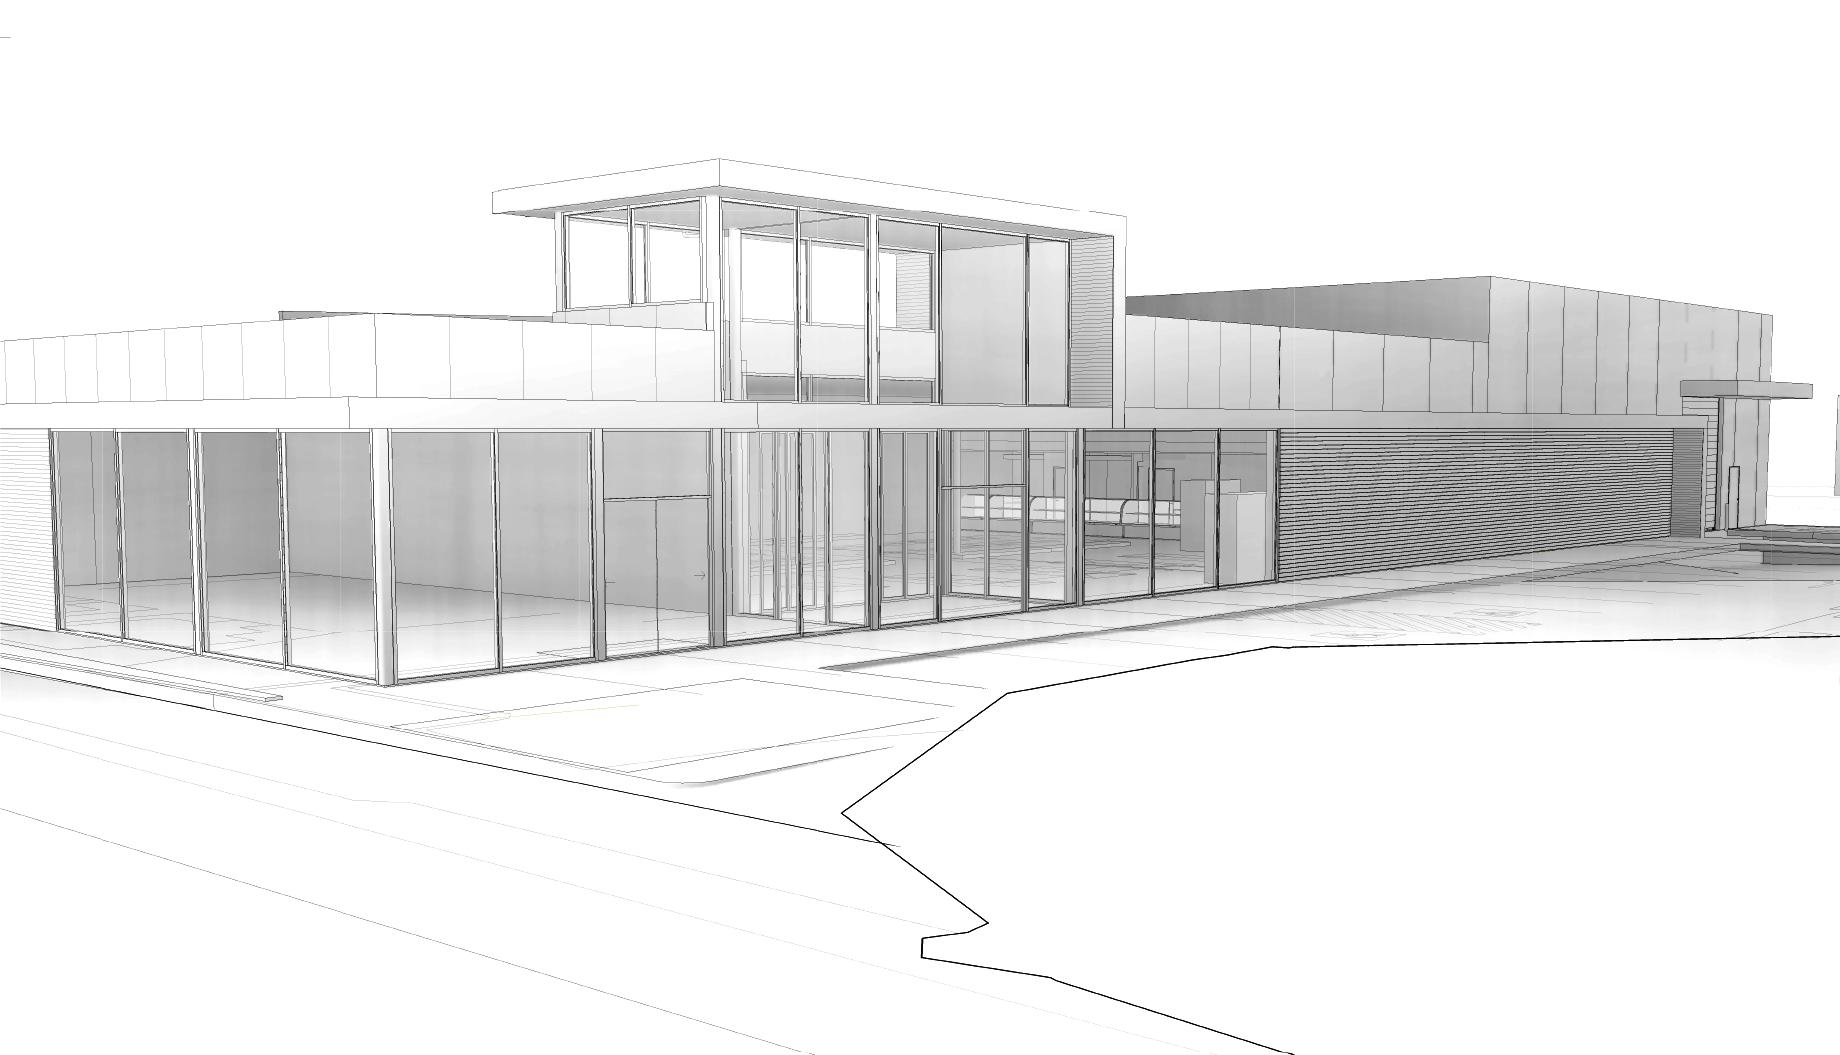 Salamanca Fresh supermarket redevelopment in Bellerive, Tasmania - sketch design